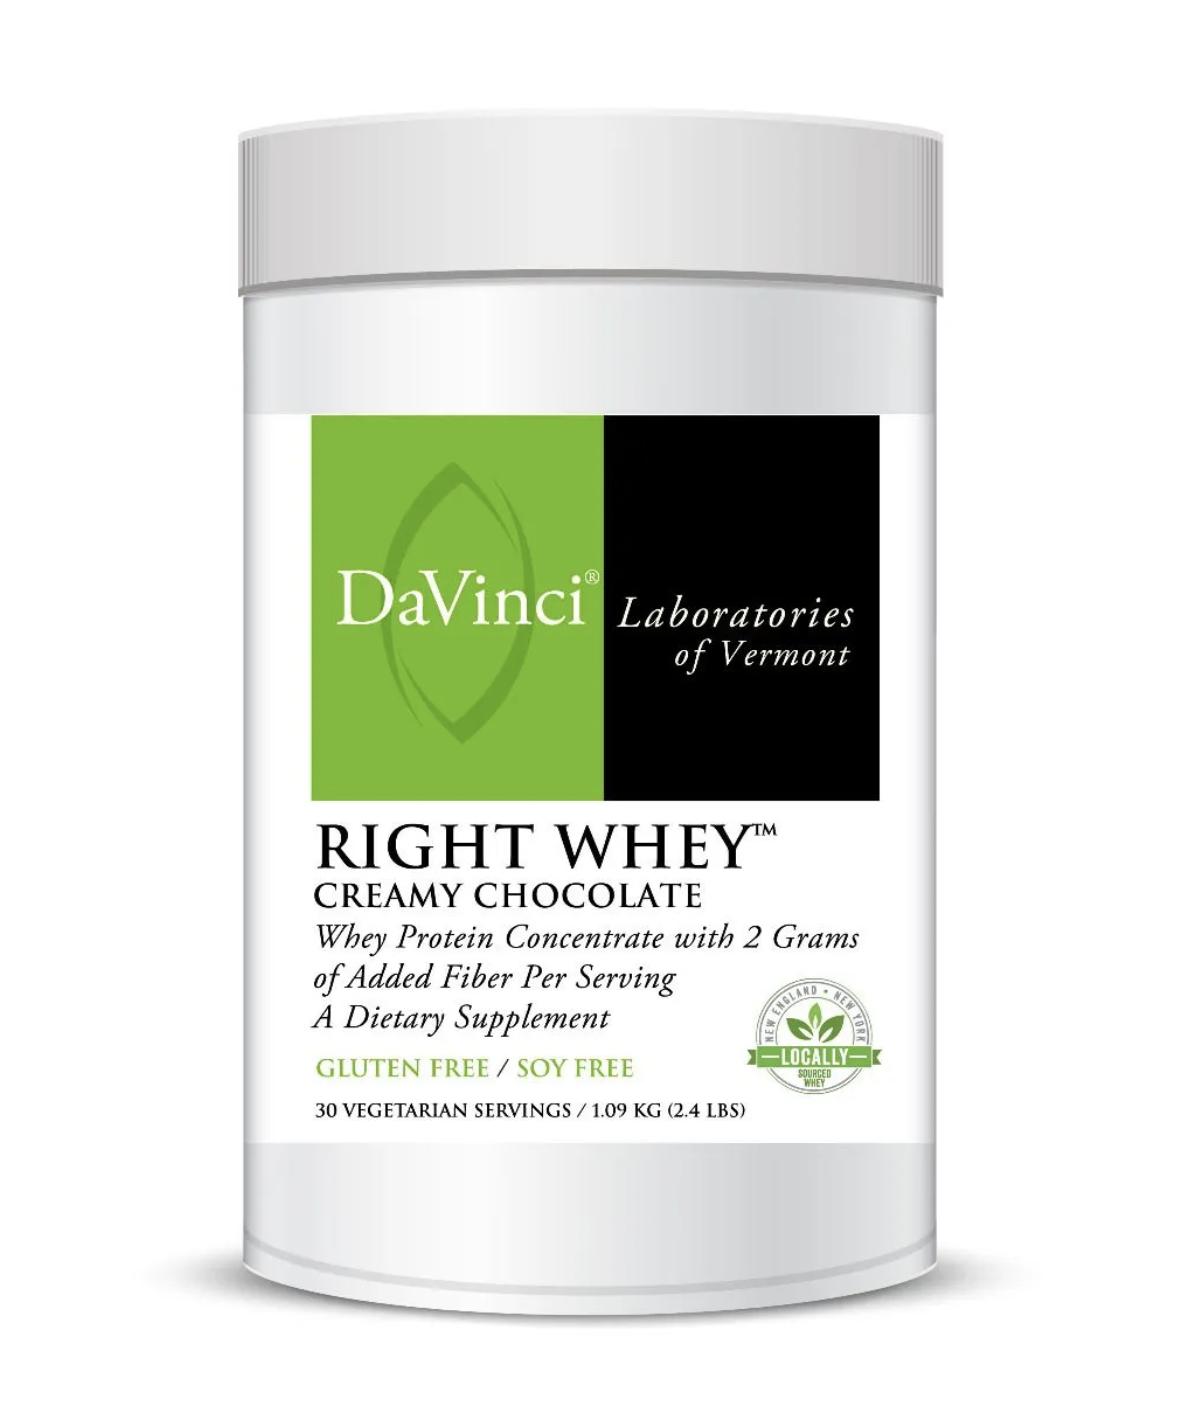 RIGHT WHEY CREAMY CHOCOLATE  30 Servings DaVinci Laboratories